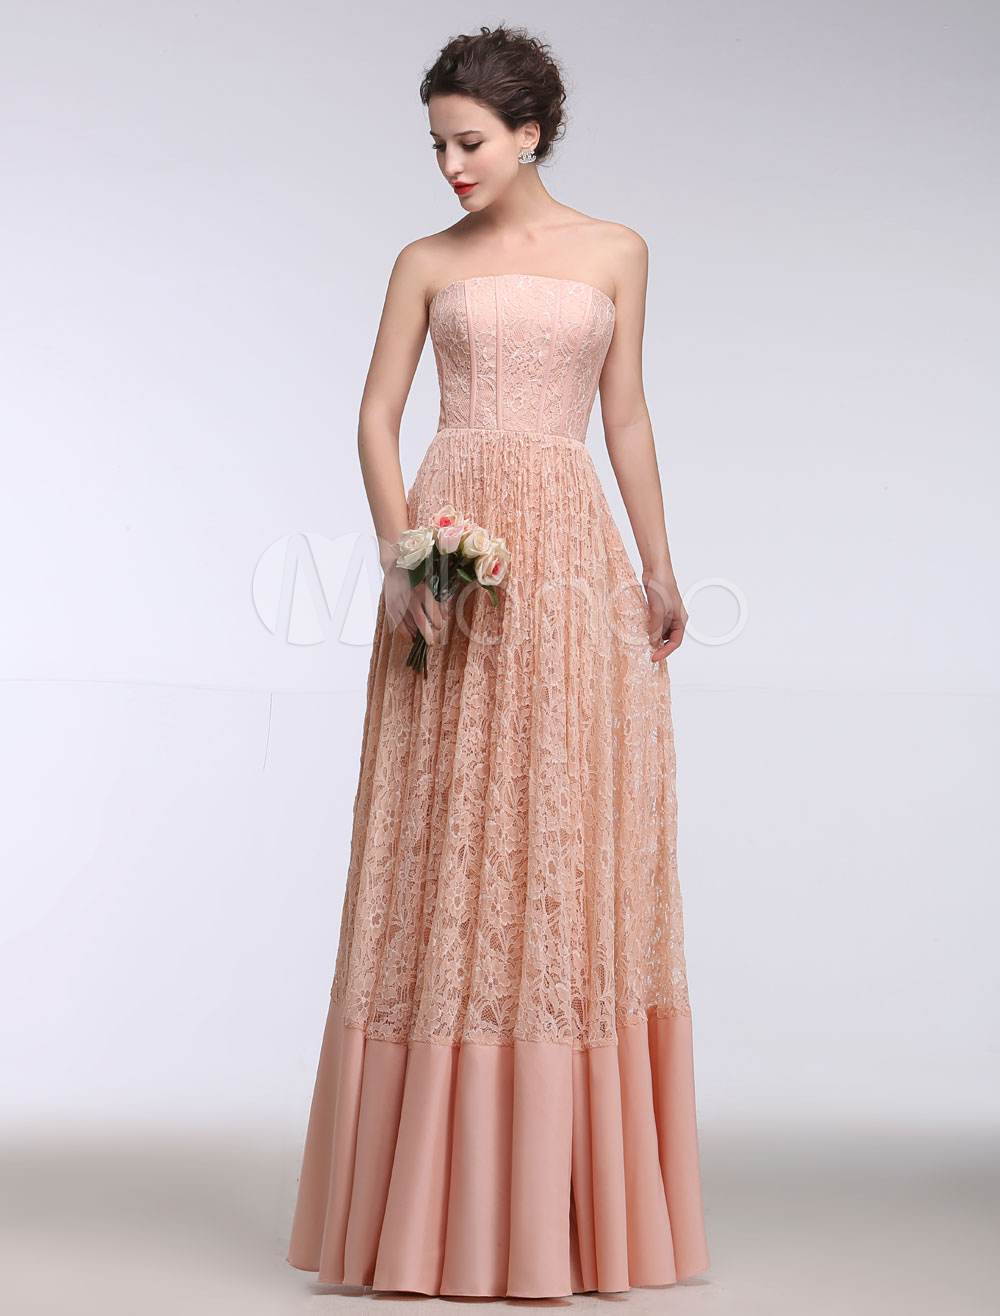 Pink Wedding Dress Lace Strapless A Line Summer Wedding Dresses 2018 Pleated Floor Length Bridal Dress (Cheap Wedding Dress) photo